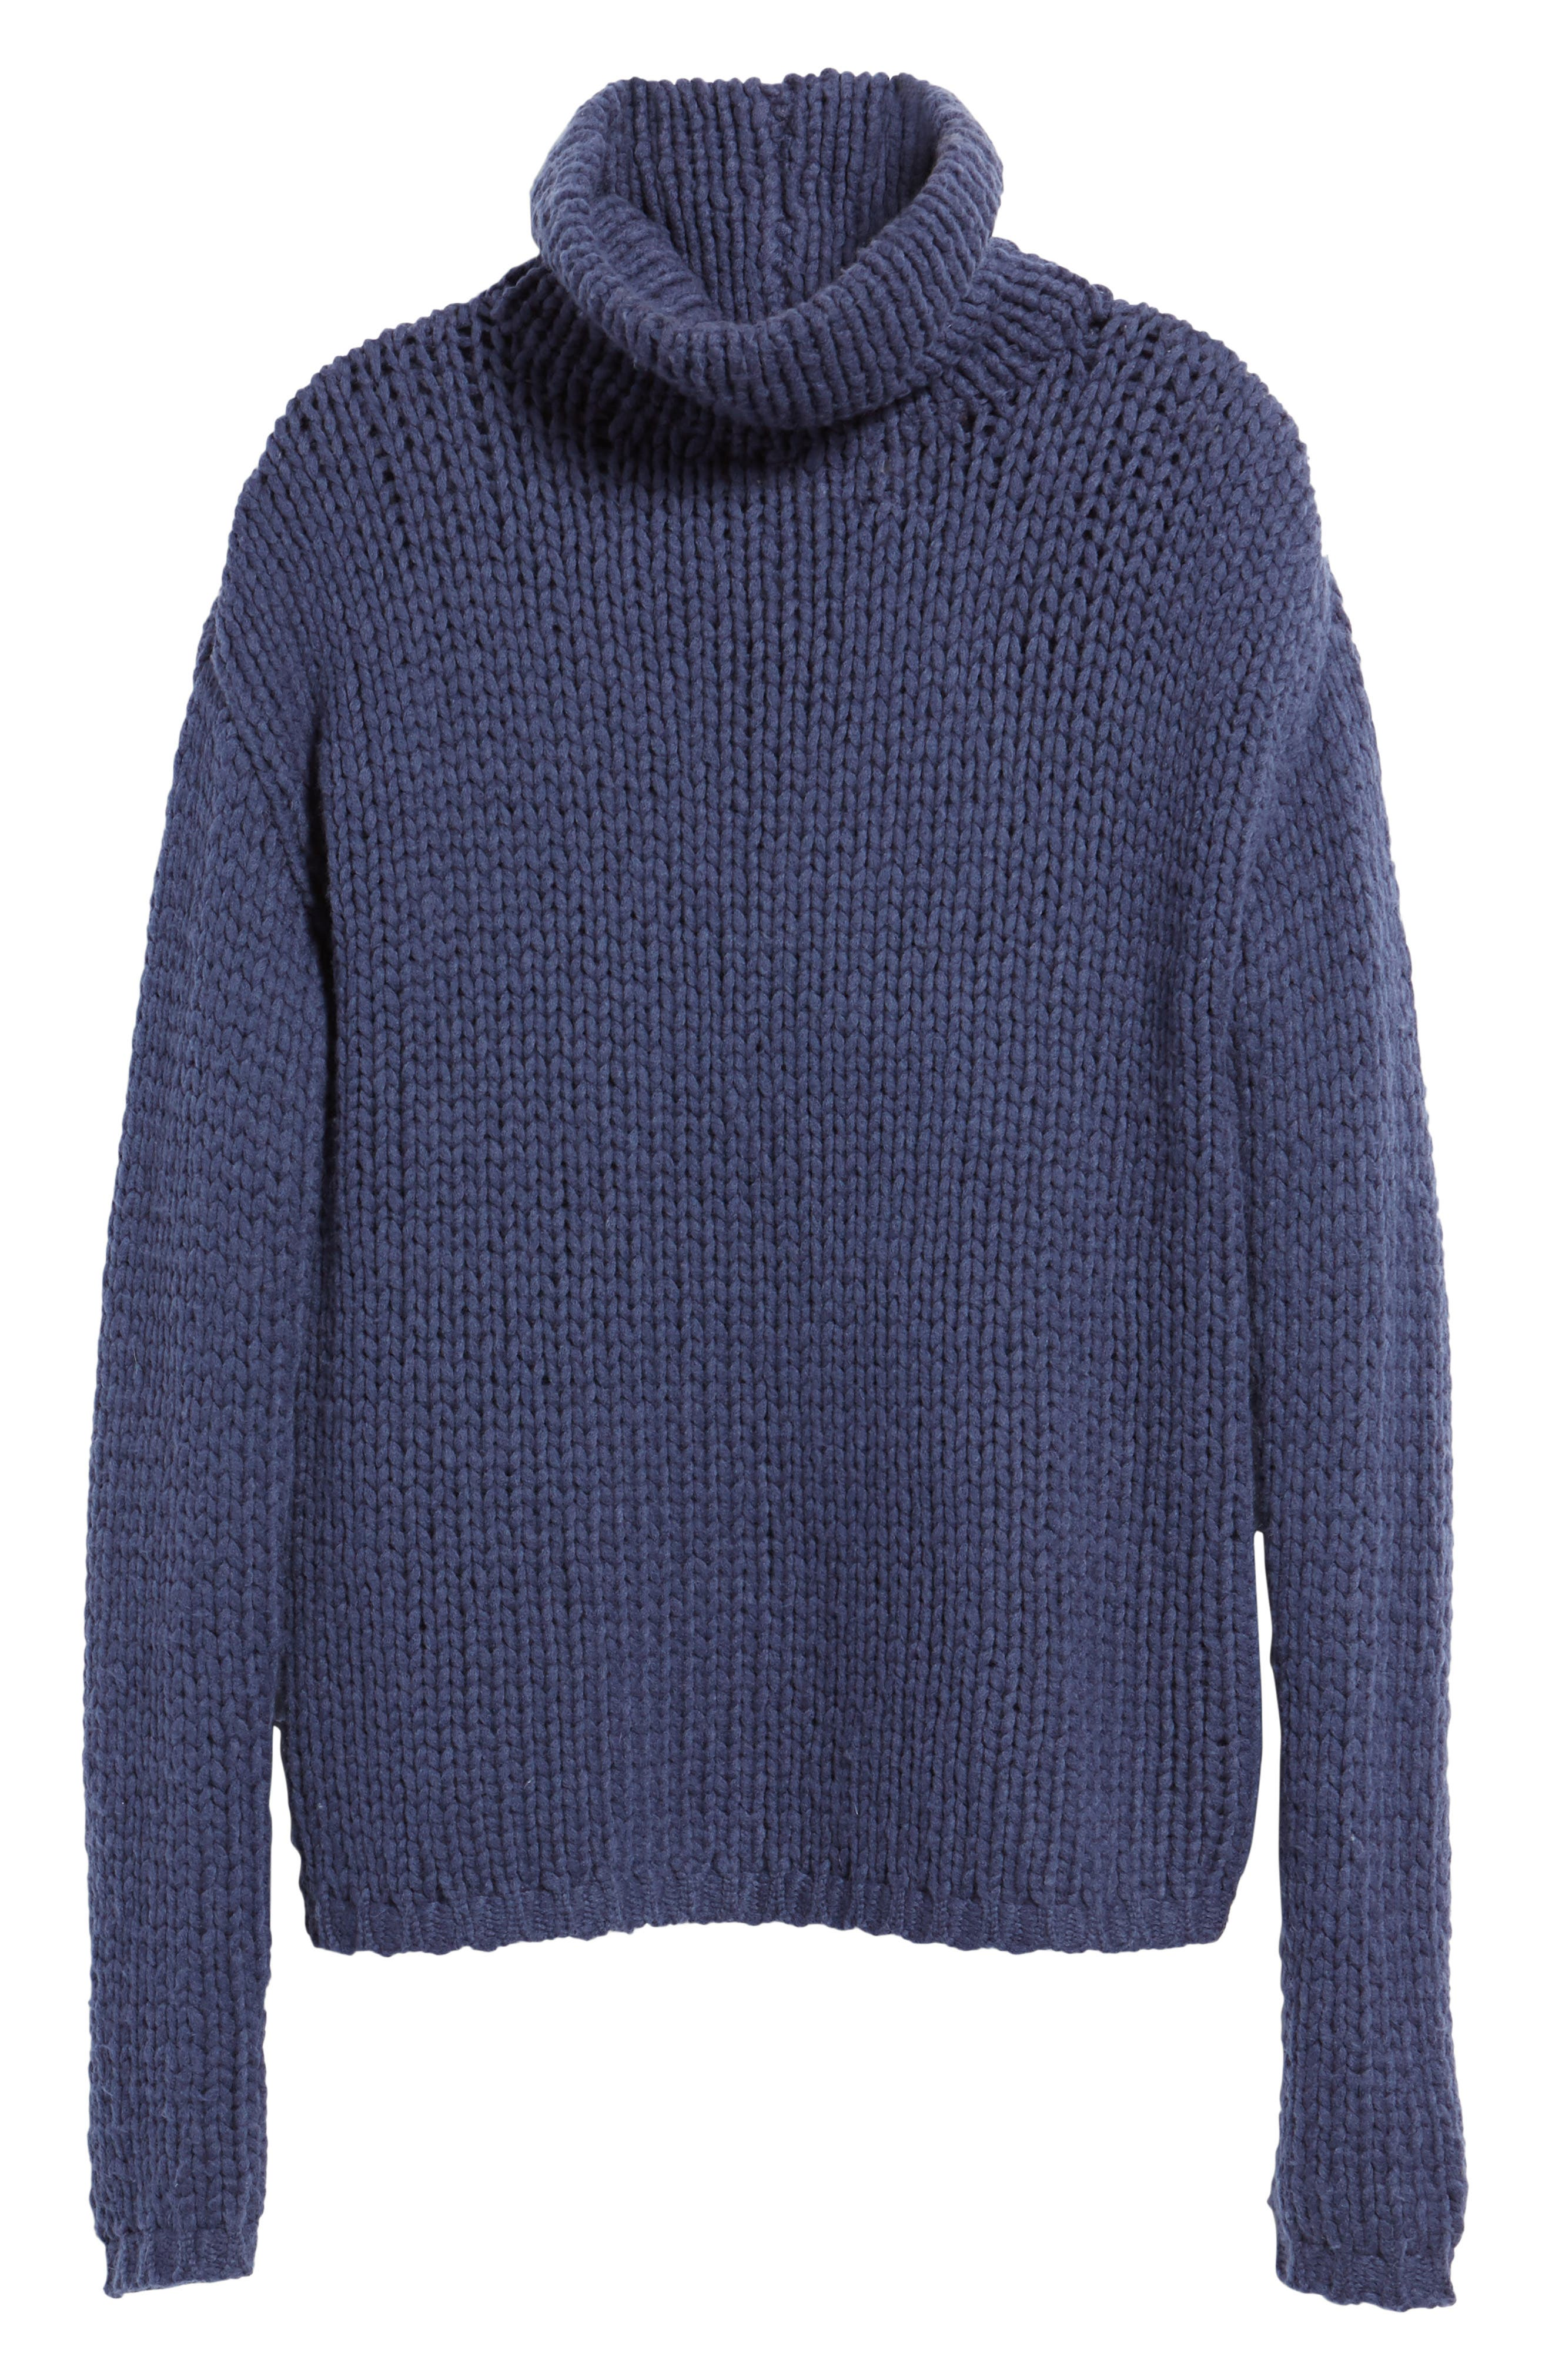 Hawken Turtleneck Sweater,                             Alternate thumbnail 6, color,                             400